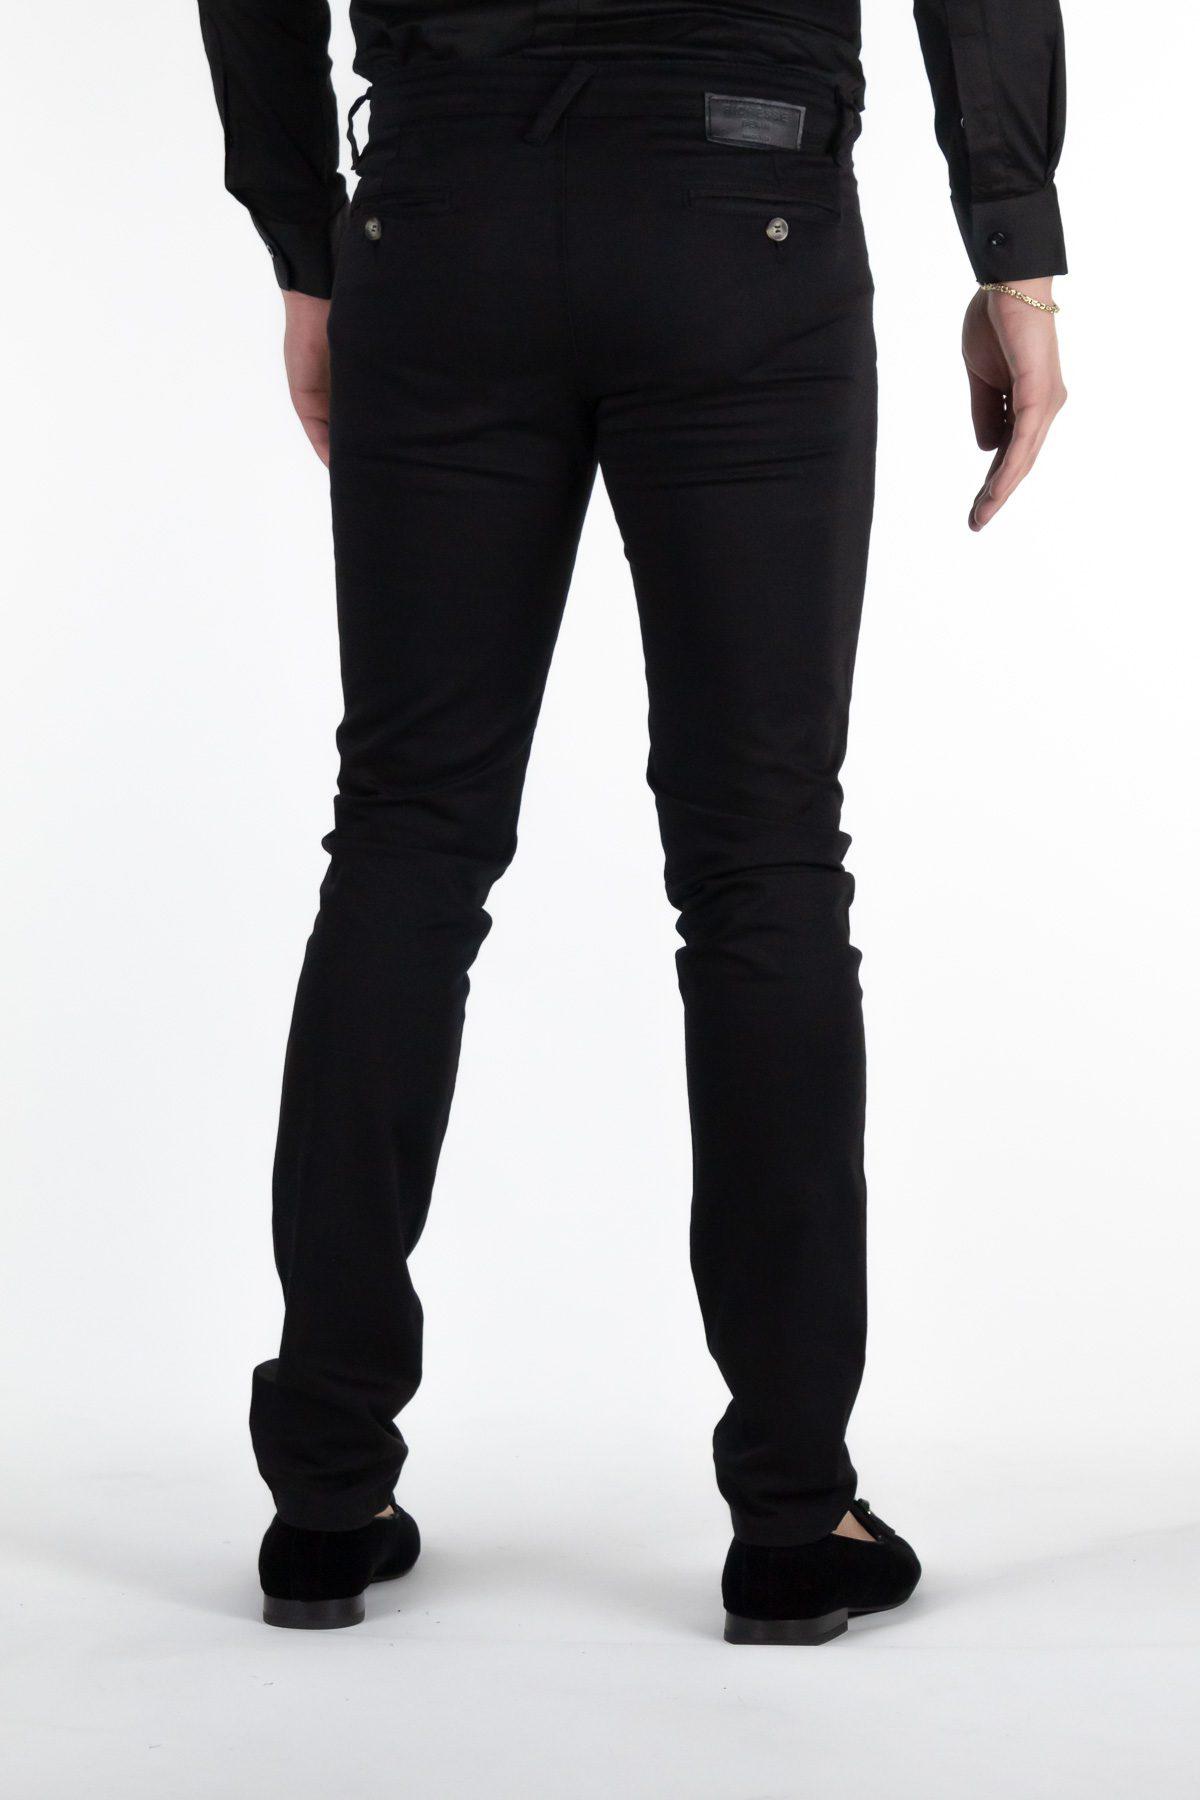 Richesse Marbella Black Pantalon 2236-4